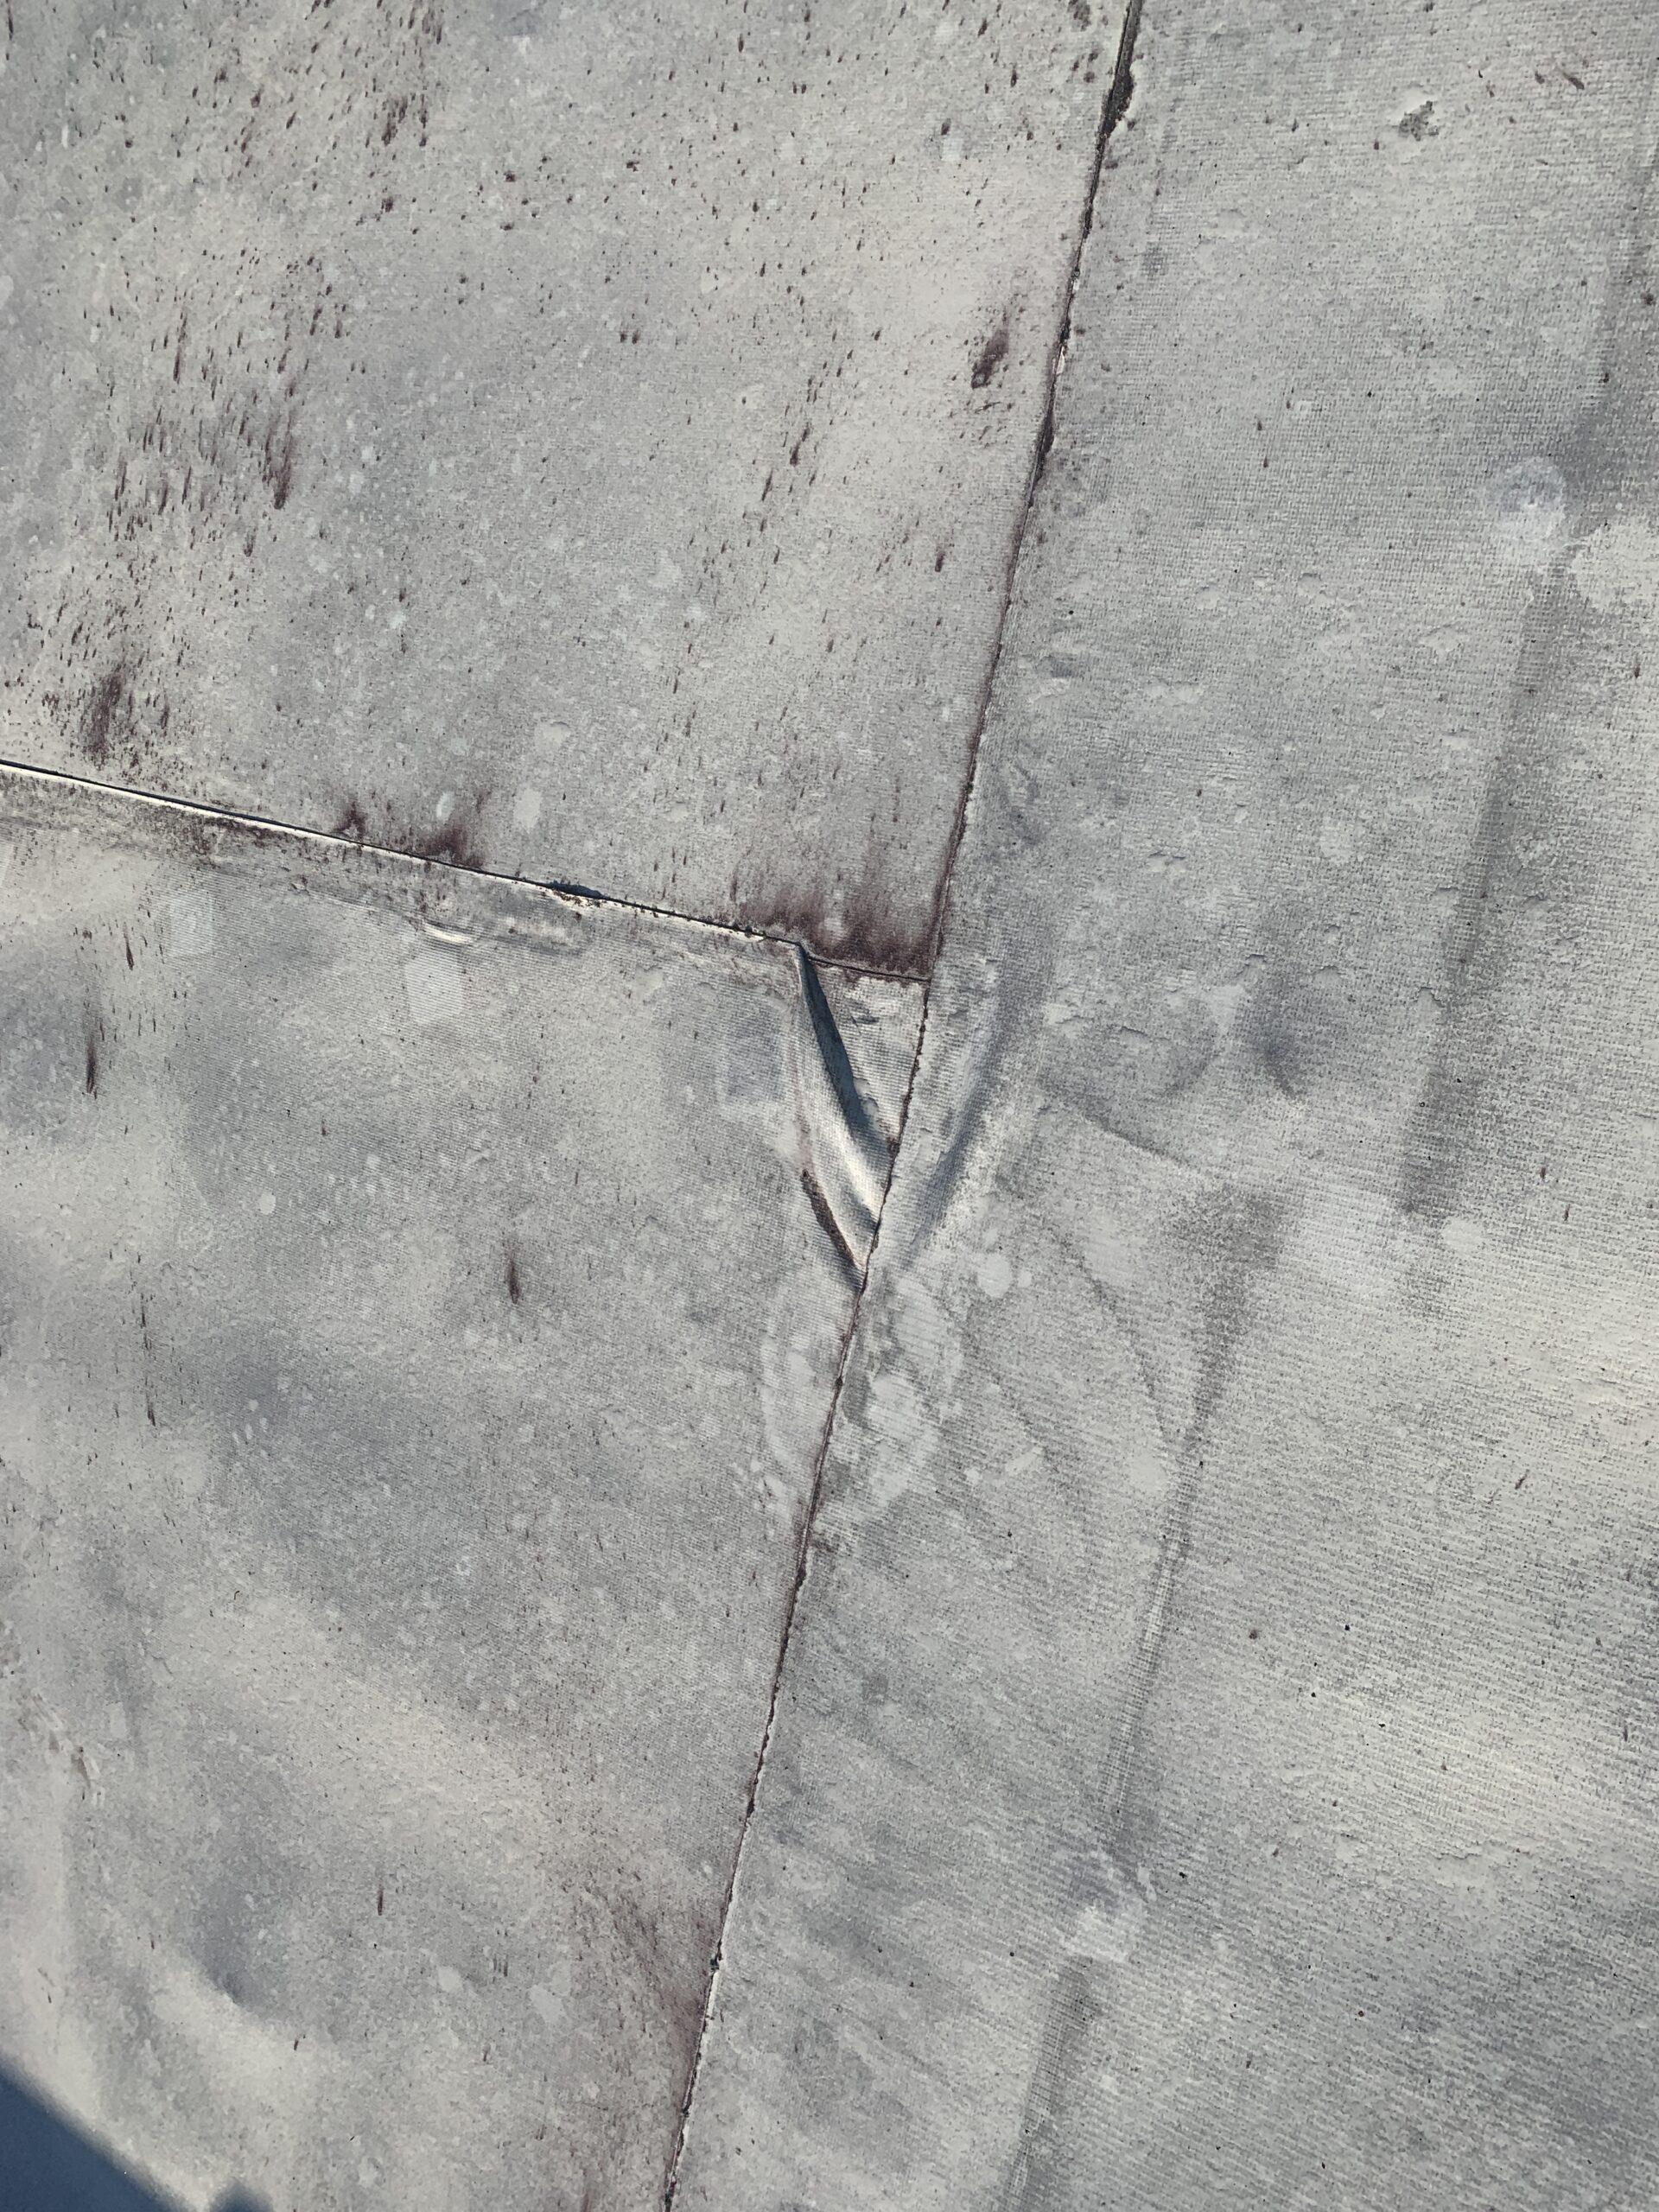 Photograph of tear in TPO membrane